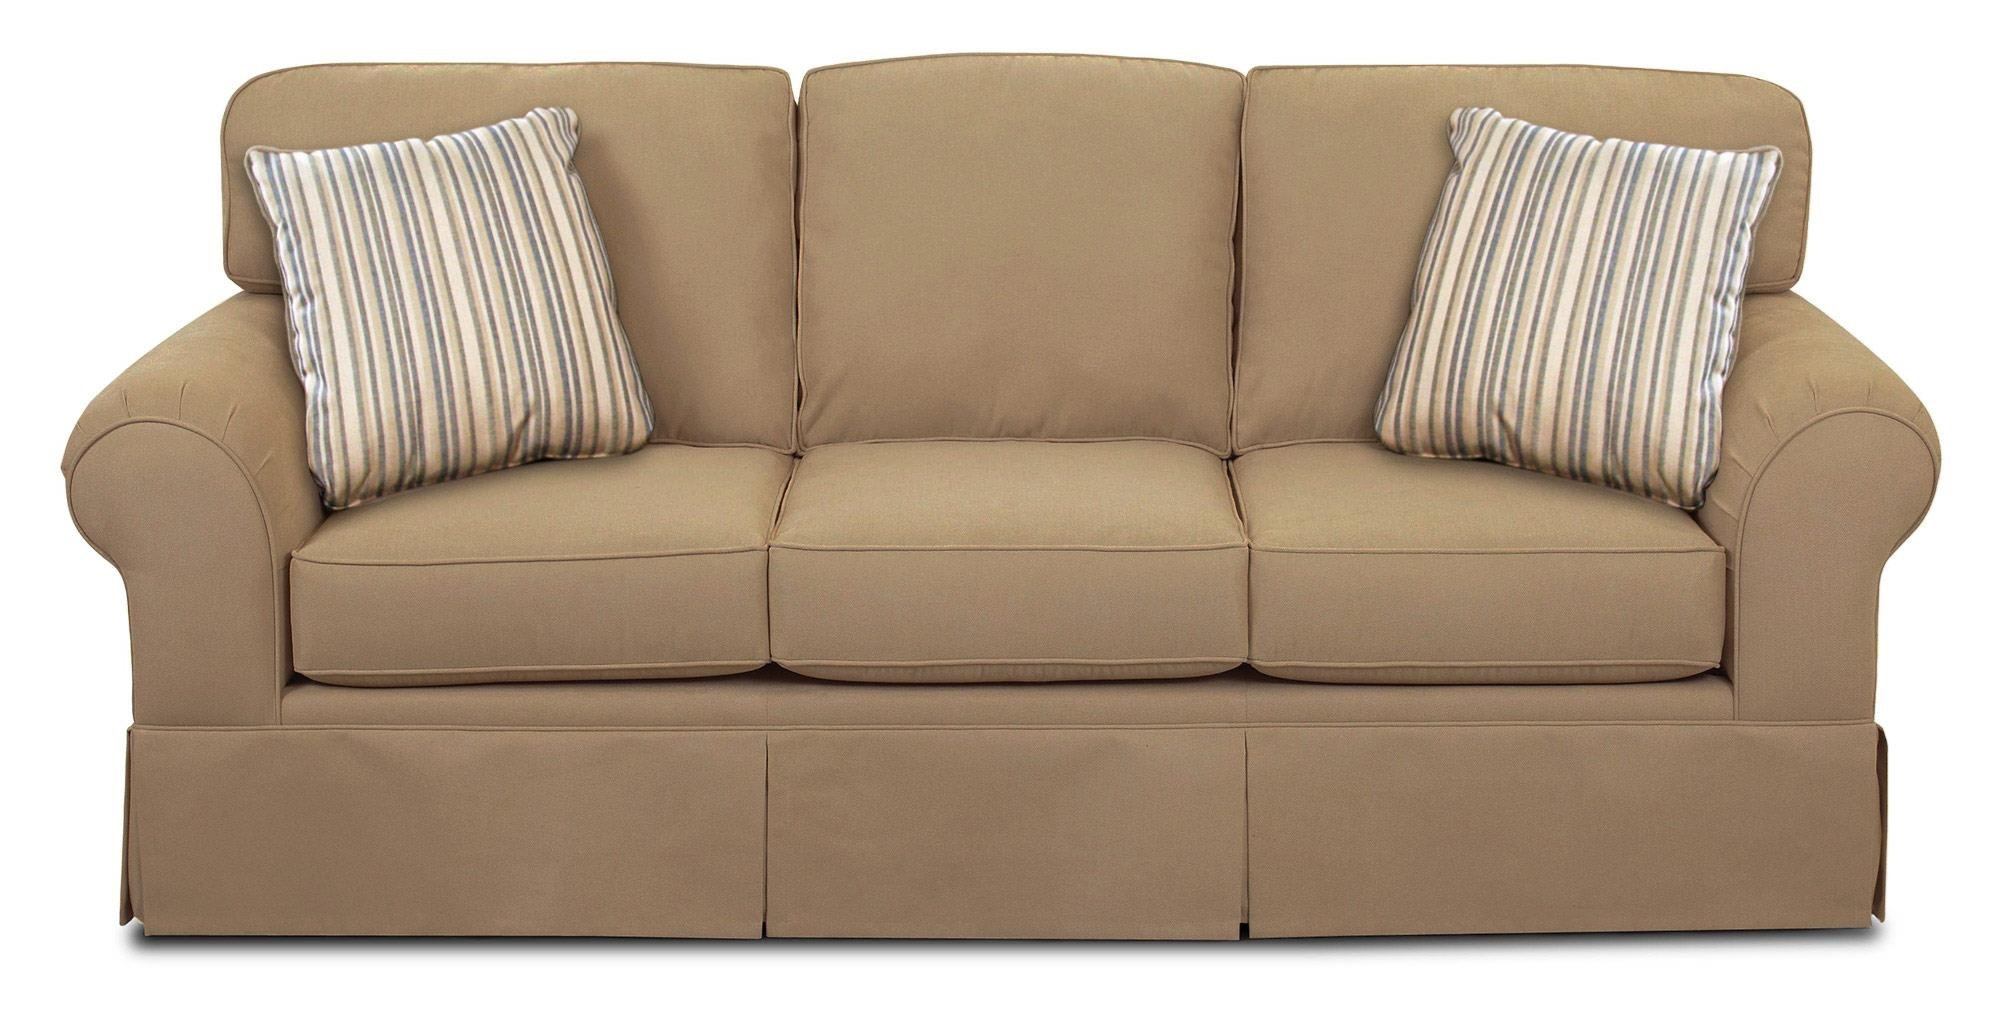 Simple Elegance Asana Skirted Sunbrella Sofa   Item Number:  B48930 S ASANABEIGE